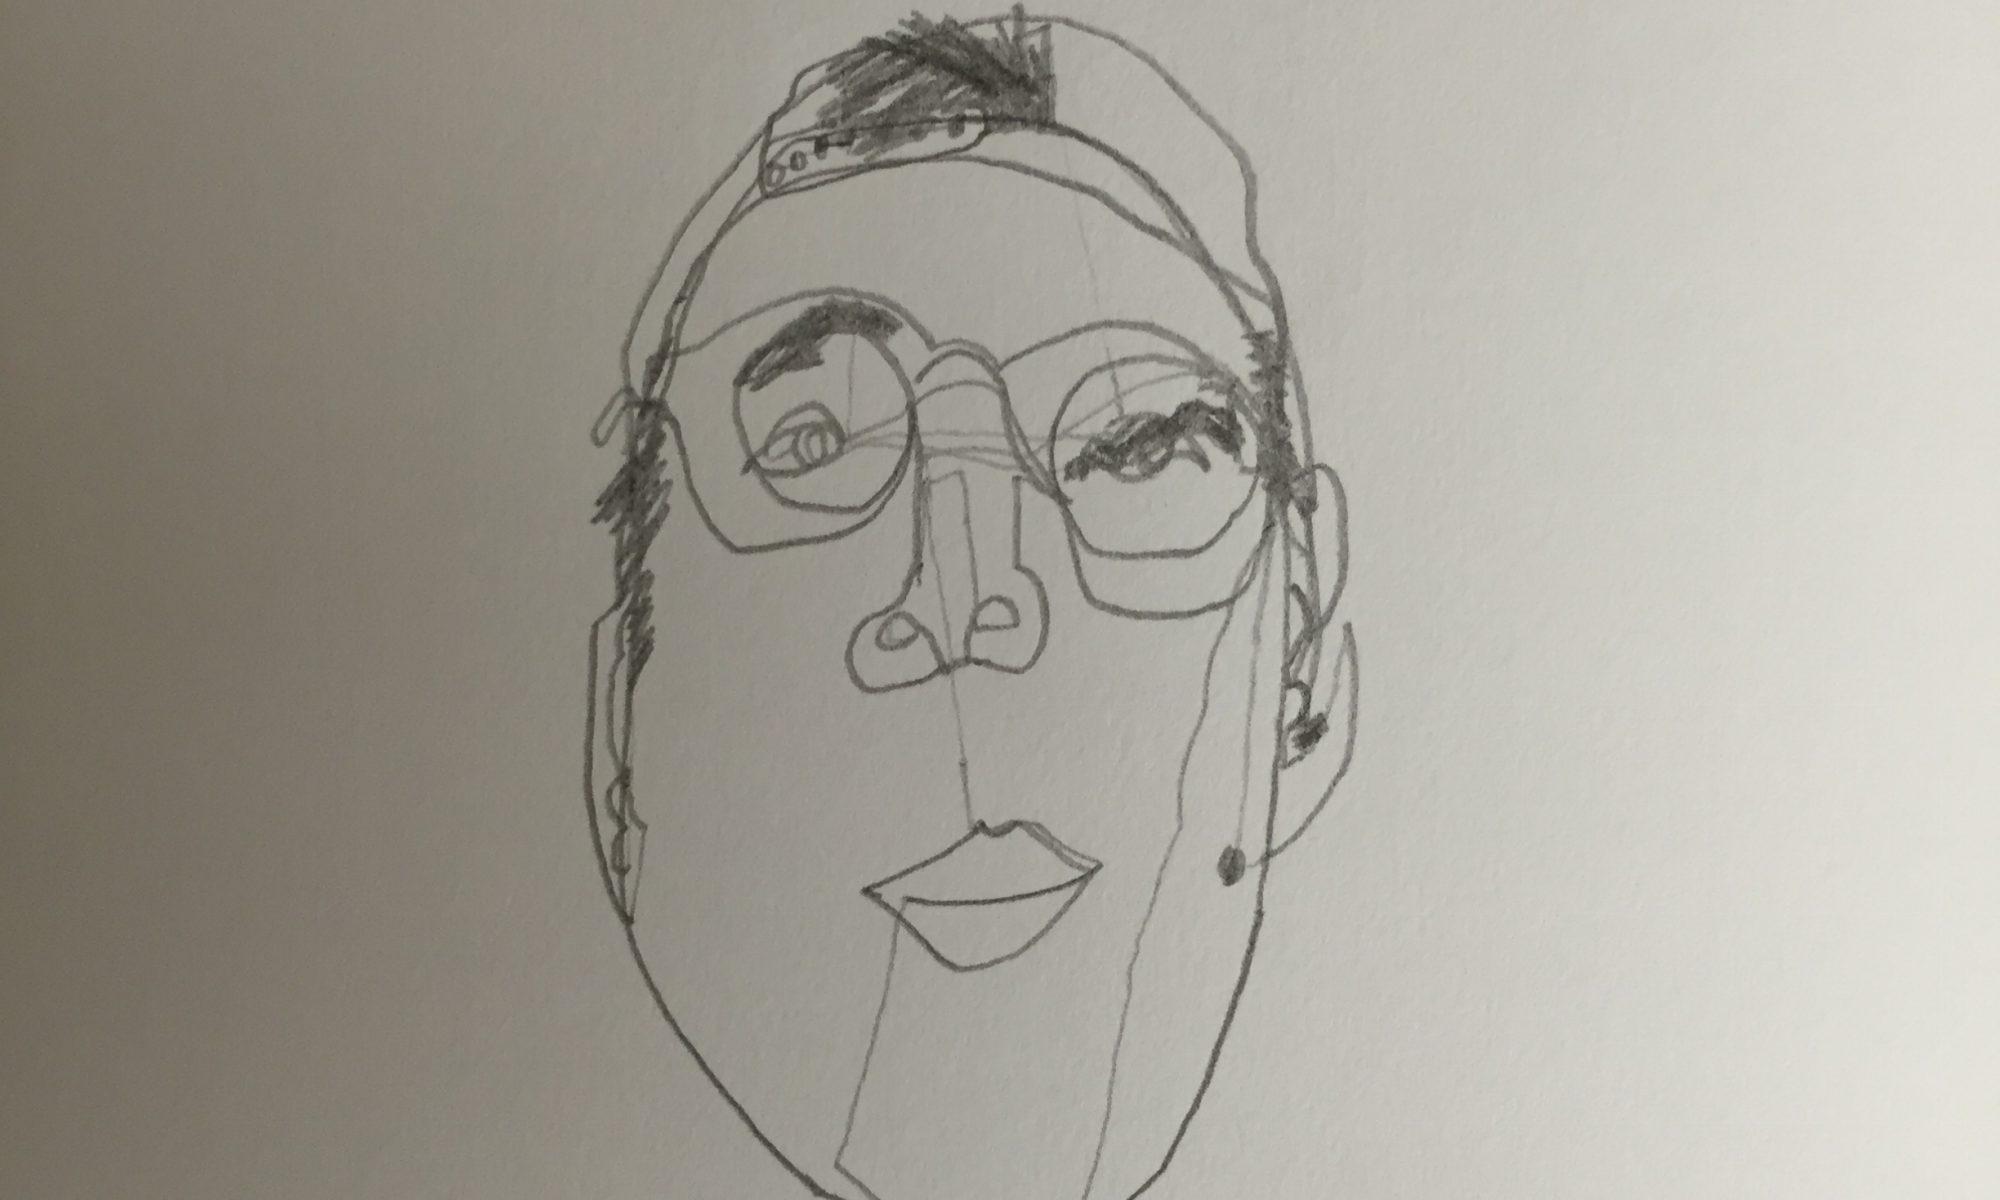 Contour Line Drawing Face : Week 1 u2013 continuous line blind contour drawing jone's artifacts